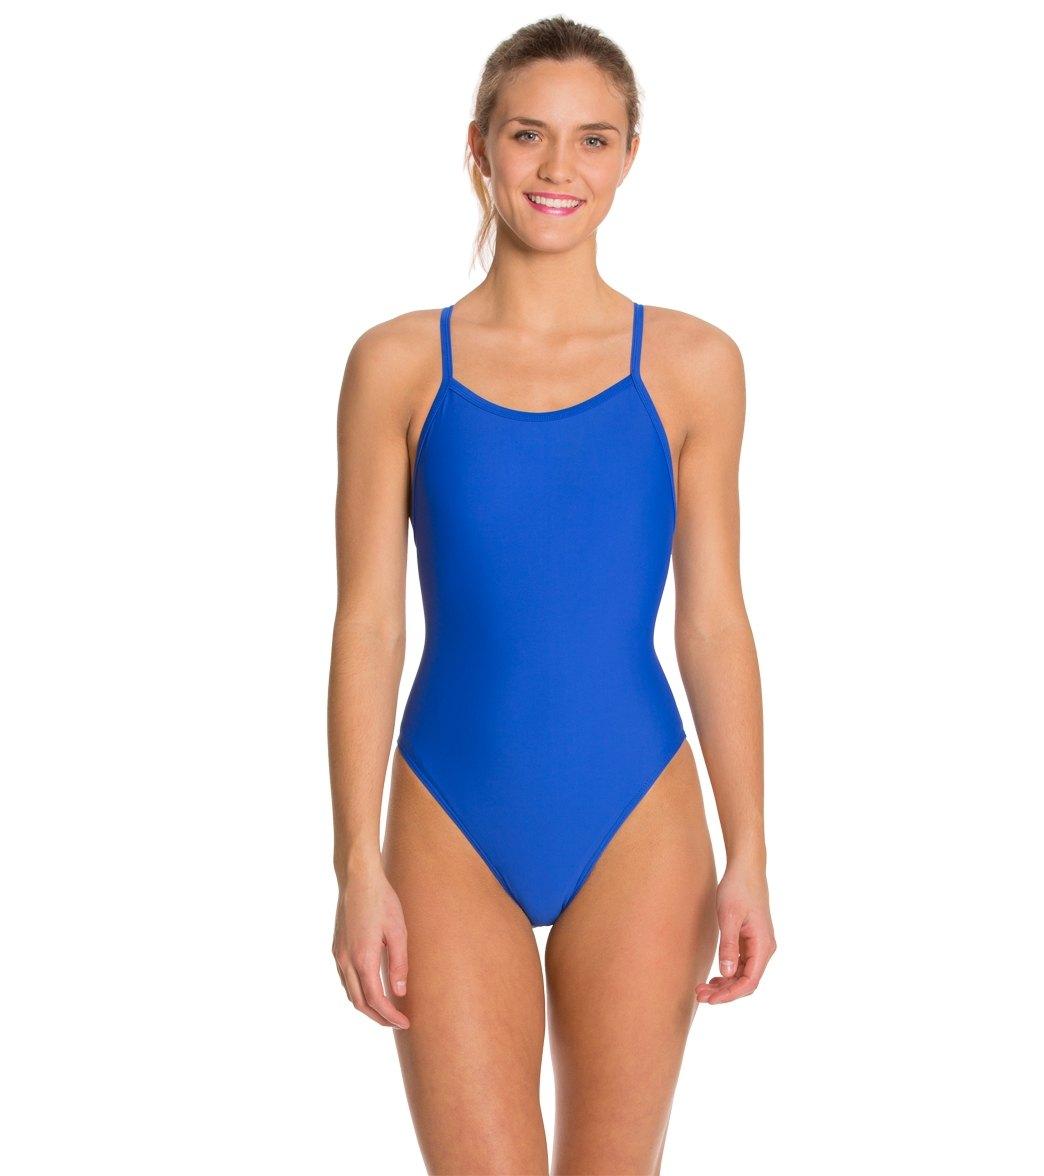 Essentials Womens Thin Strap One-Piece Swimsuit